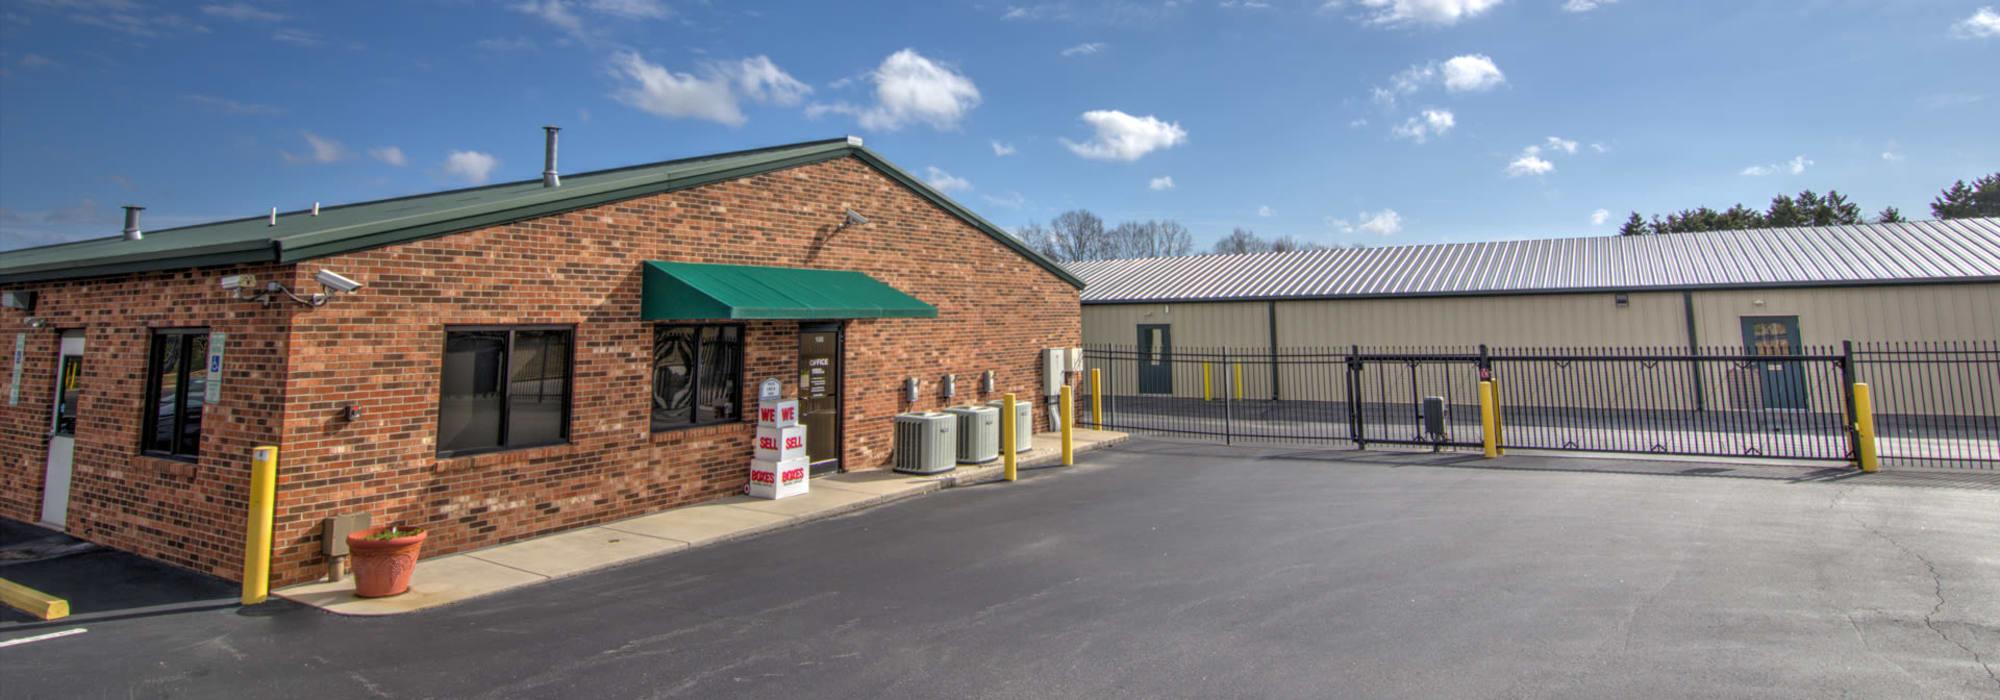 Prime Storage in Winston-Salem, NC